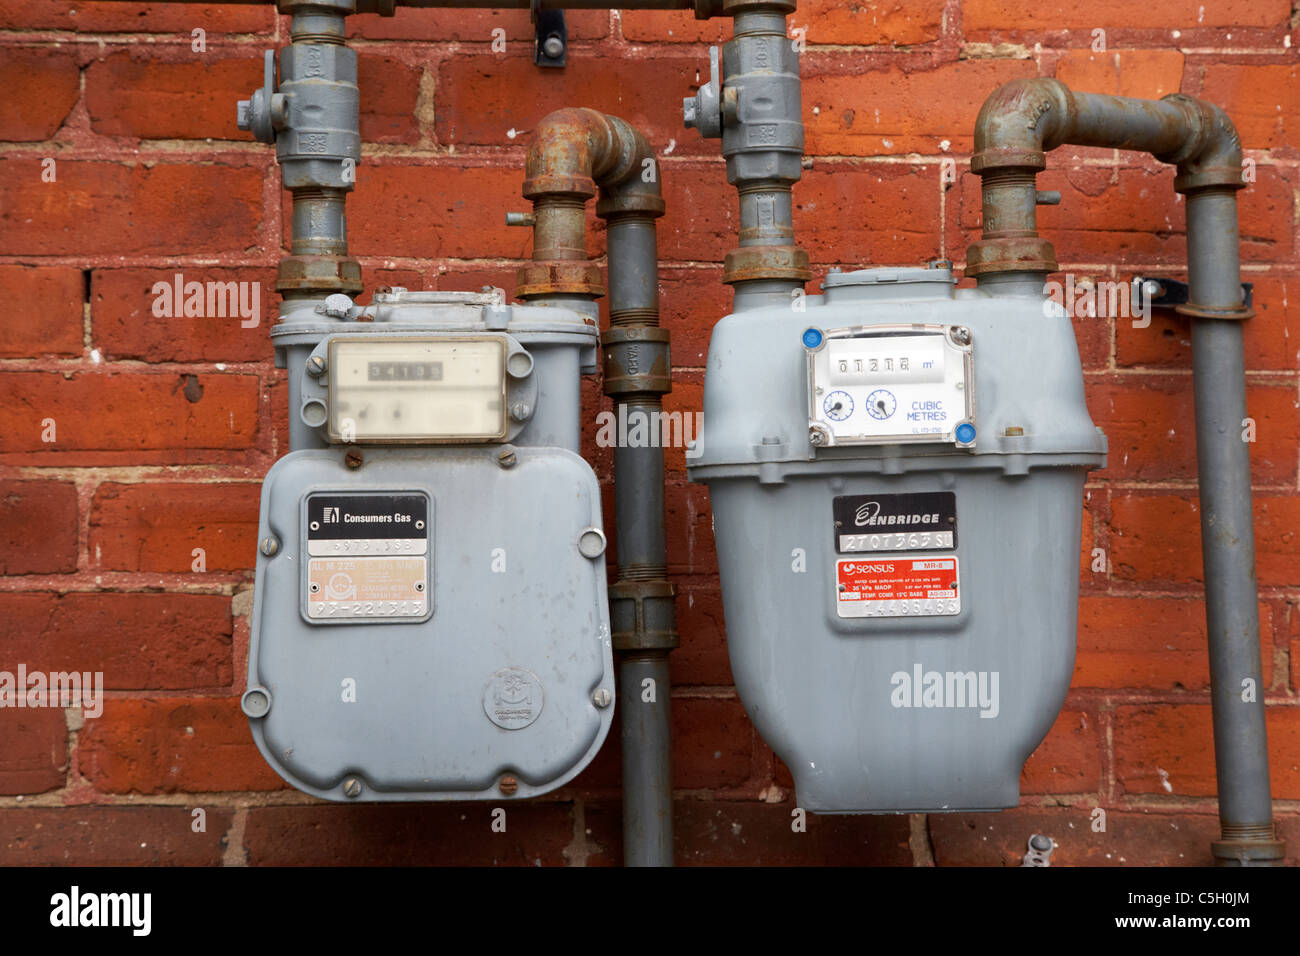 landis gyr gas meter instructions